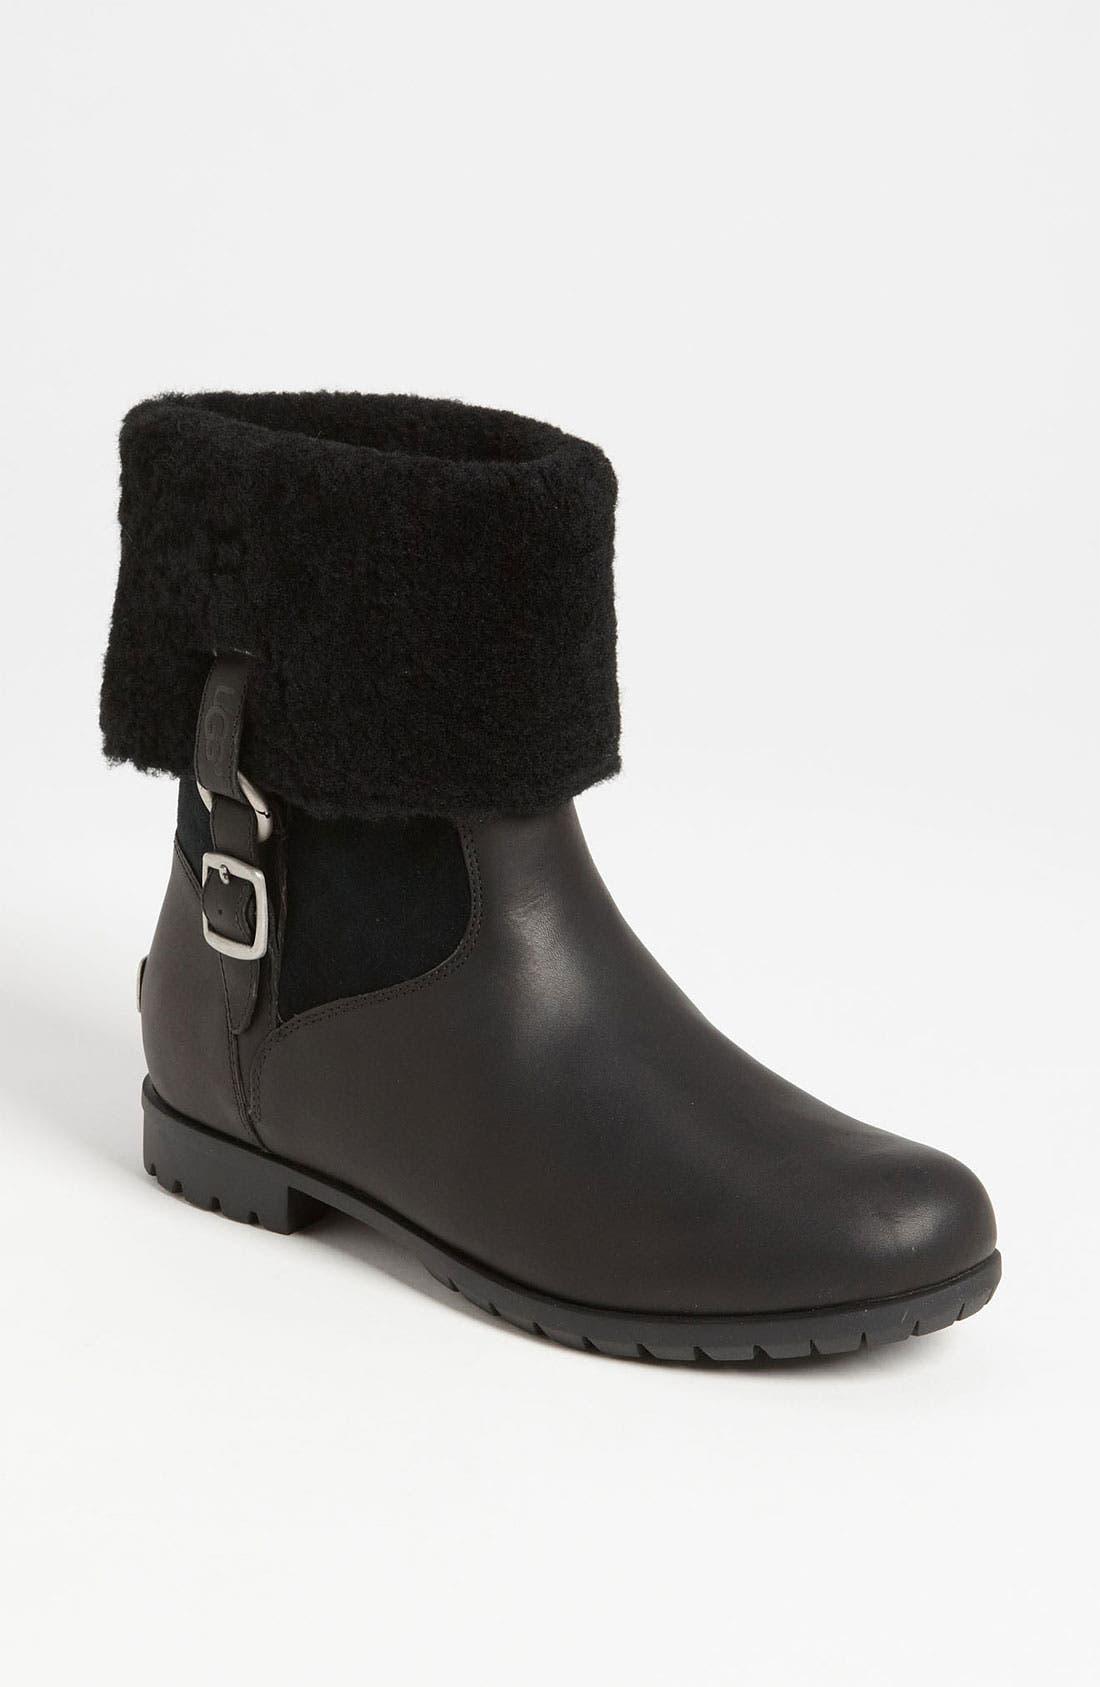 Alternate Image 1 Selected - UGG® Australia 'Bellvue III' Boot (Women)